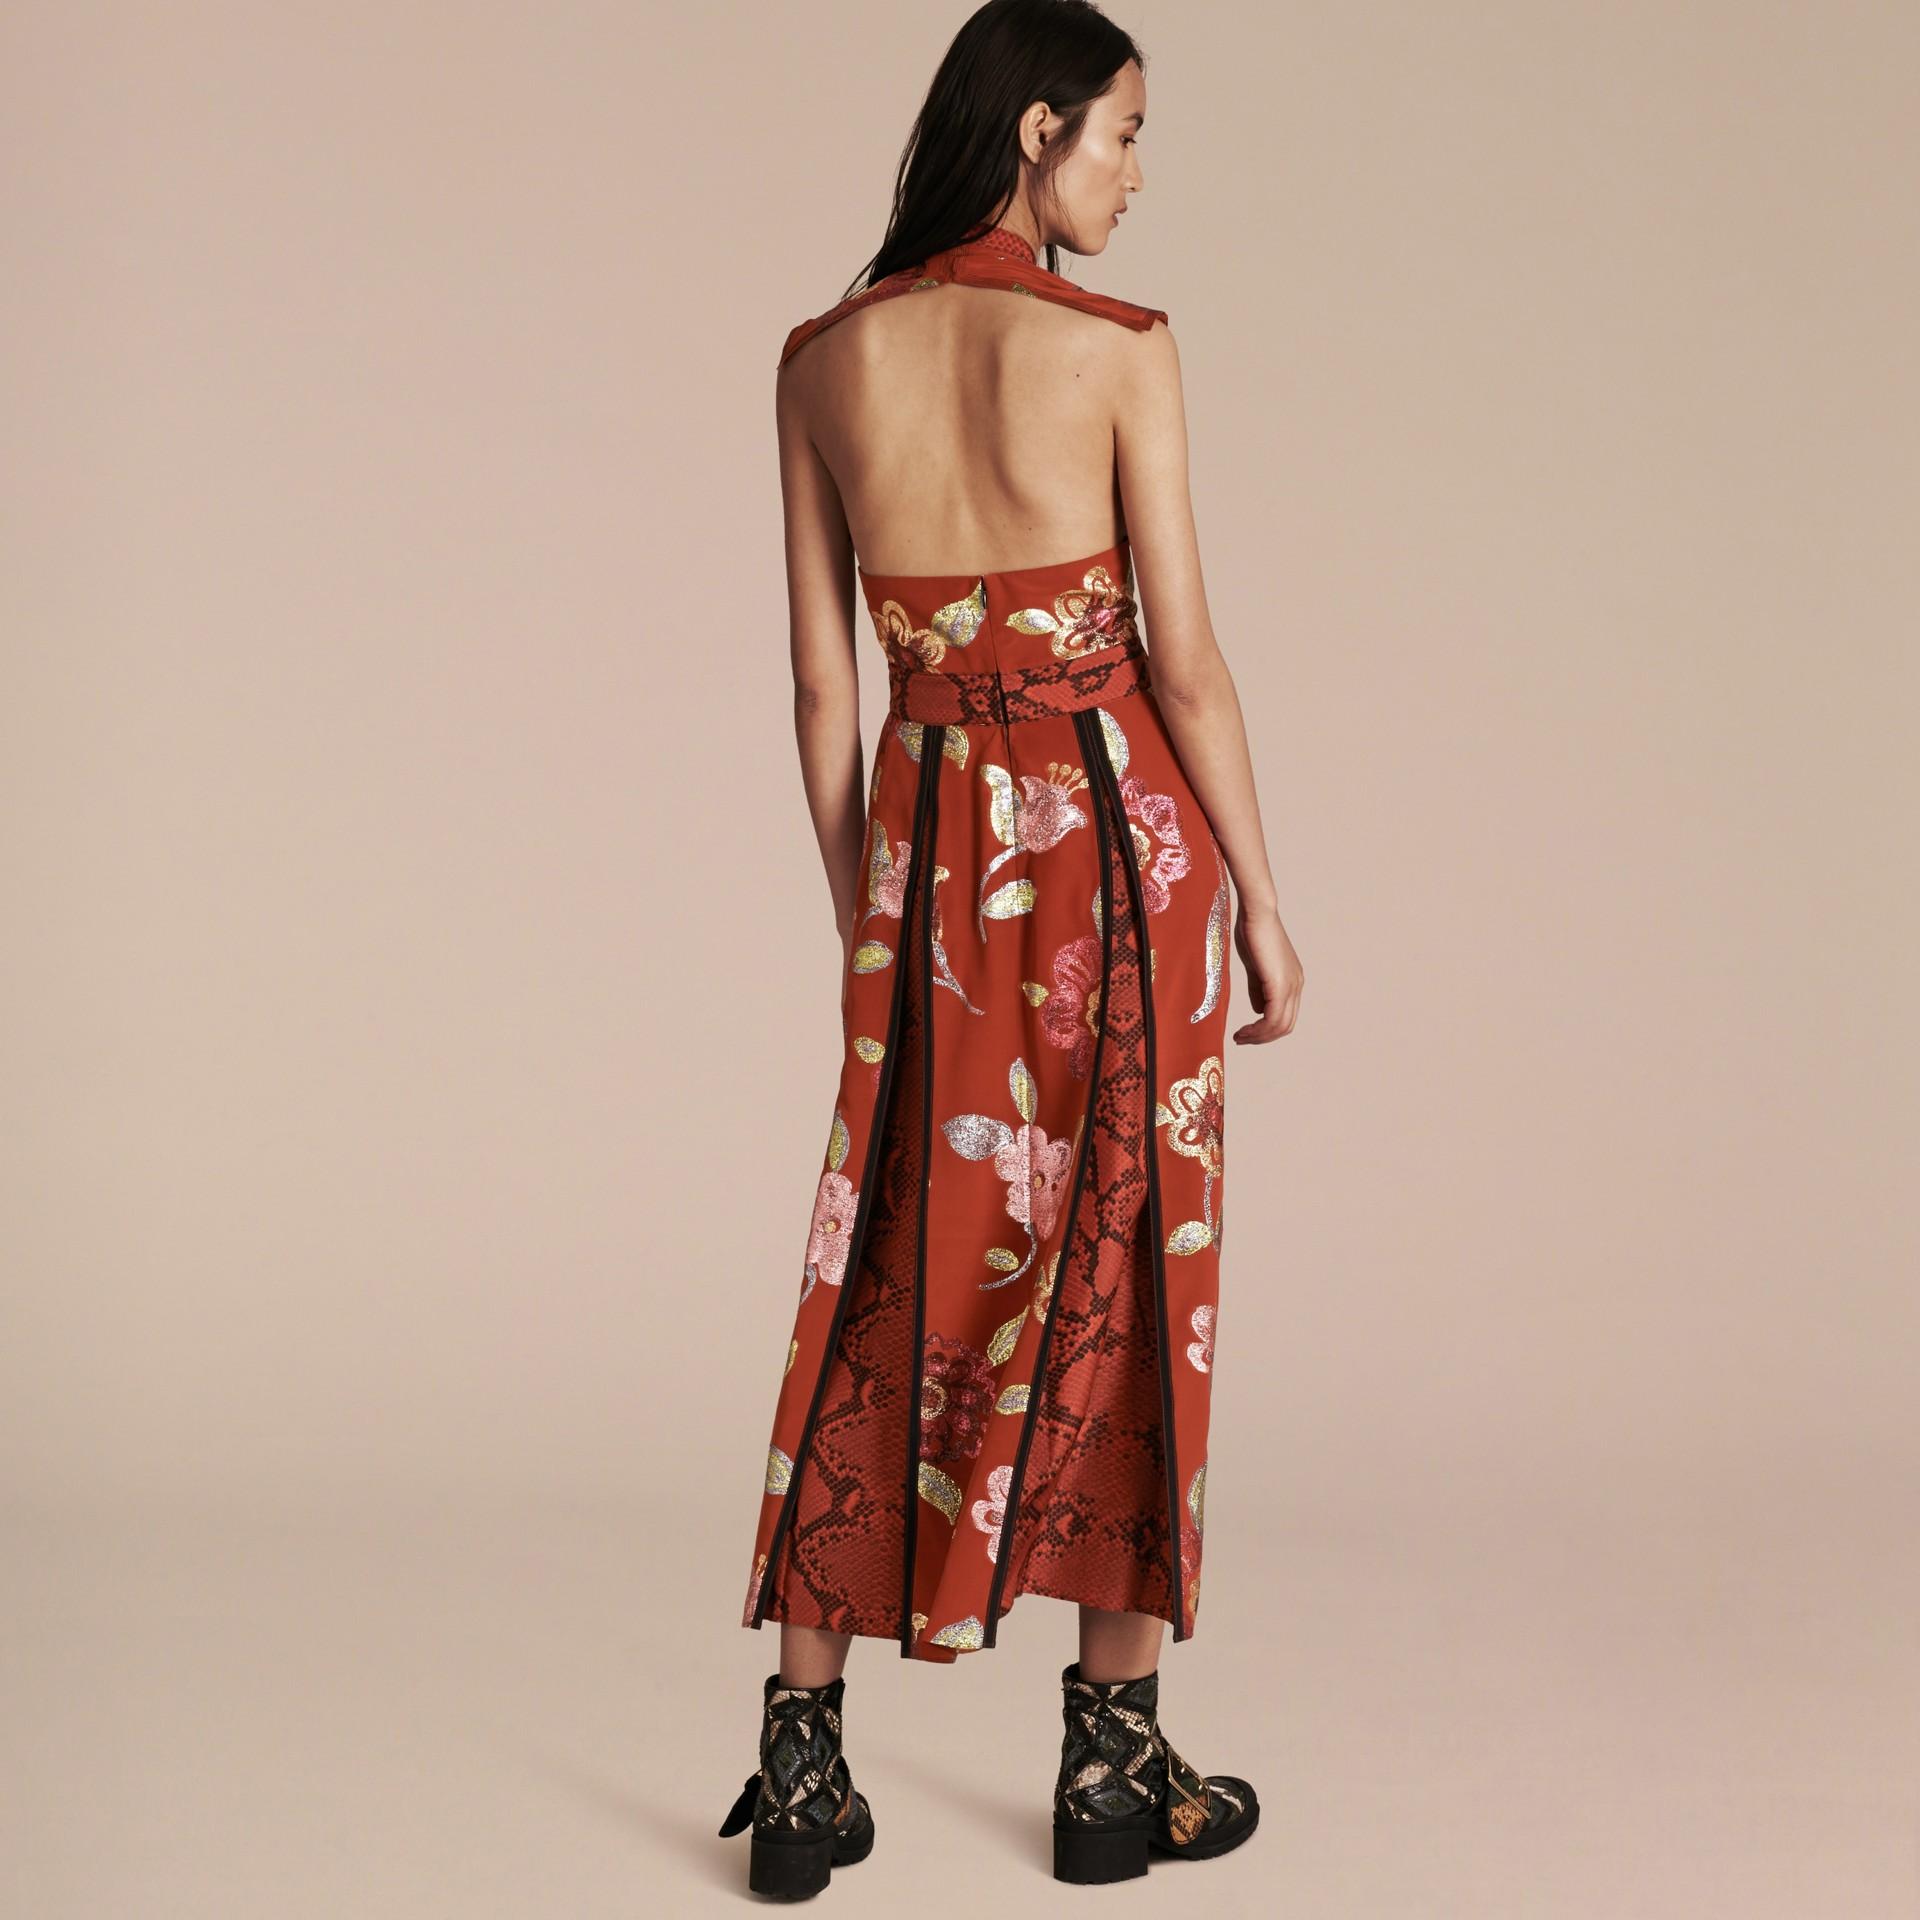 Burnt sienna Floral Fil Coupé Silk Dress - gallery image 3